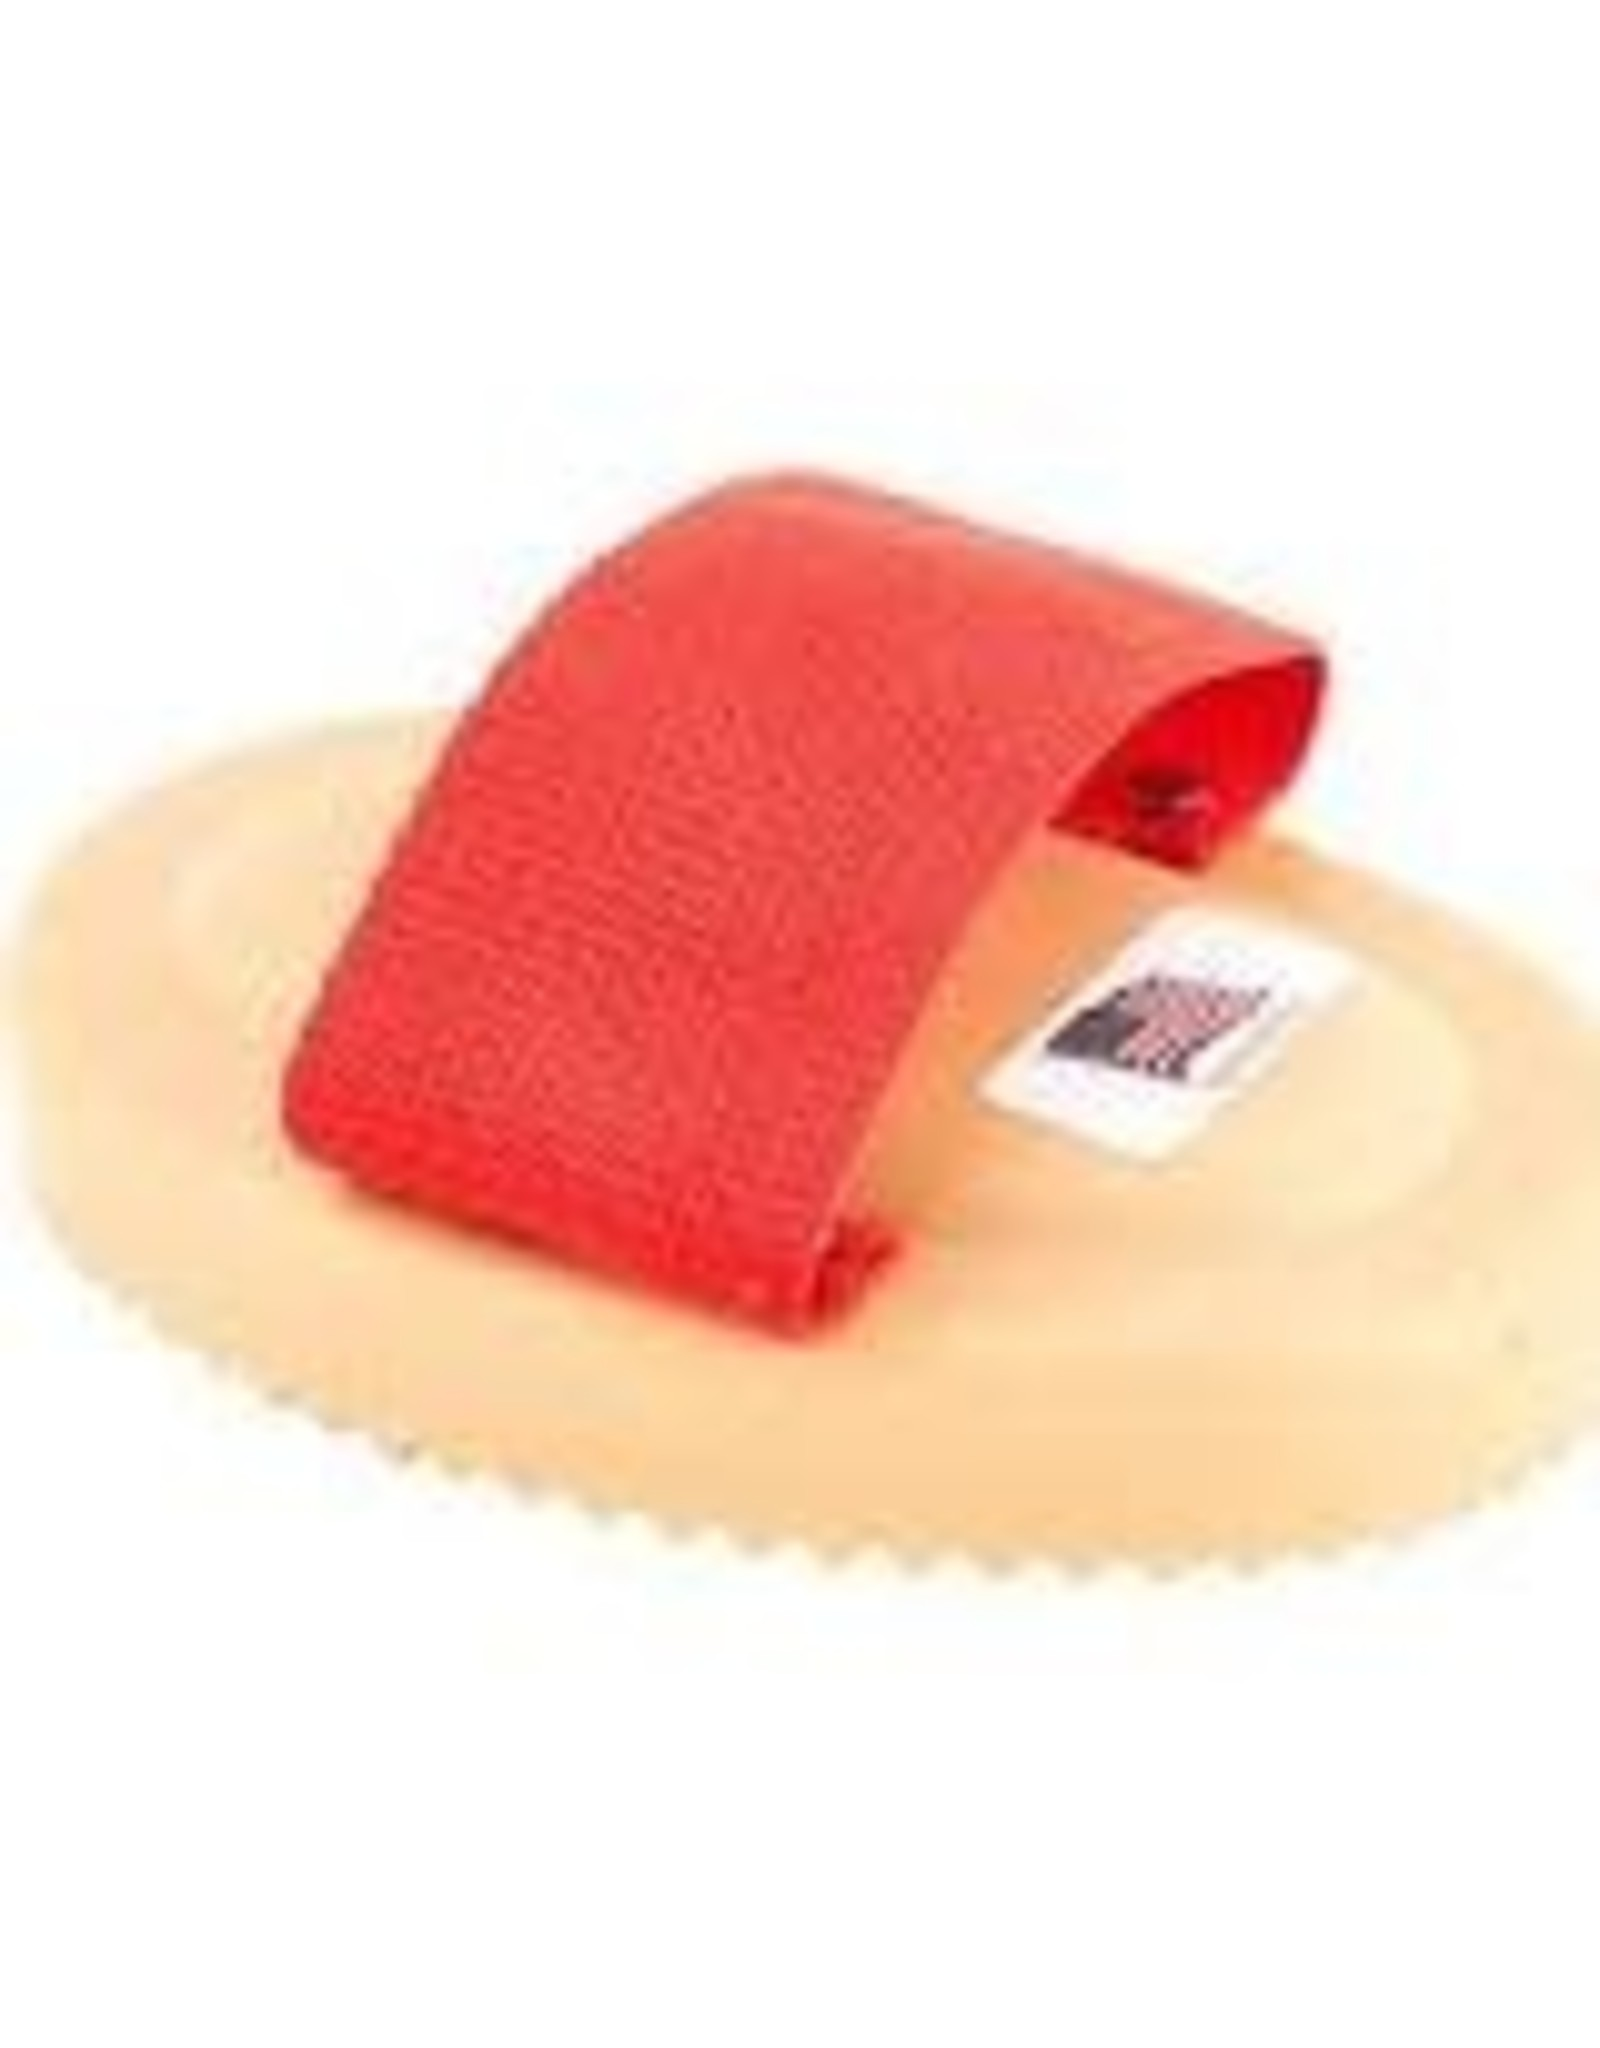 CST Flexible Decker Curry Comb